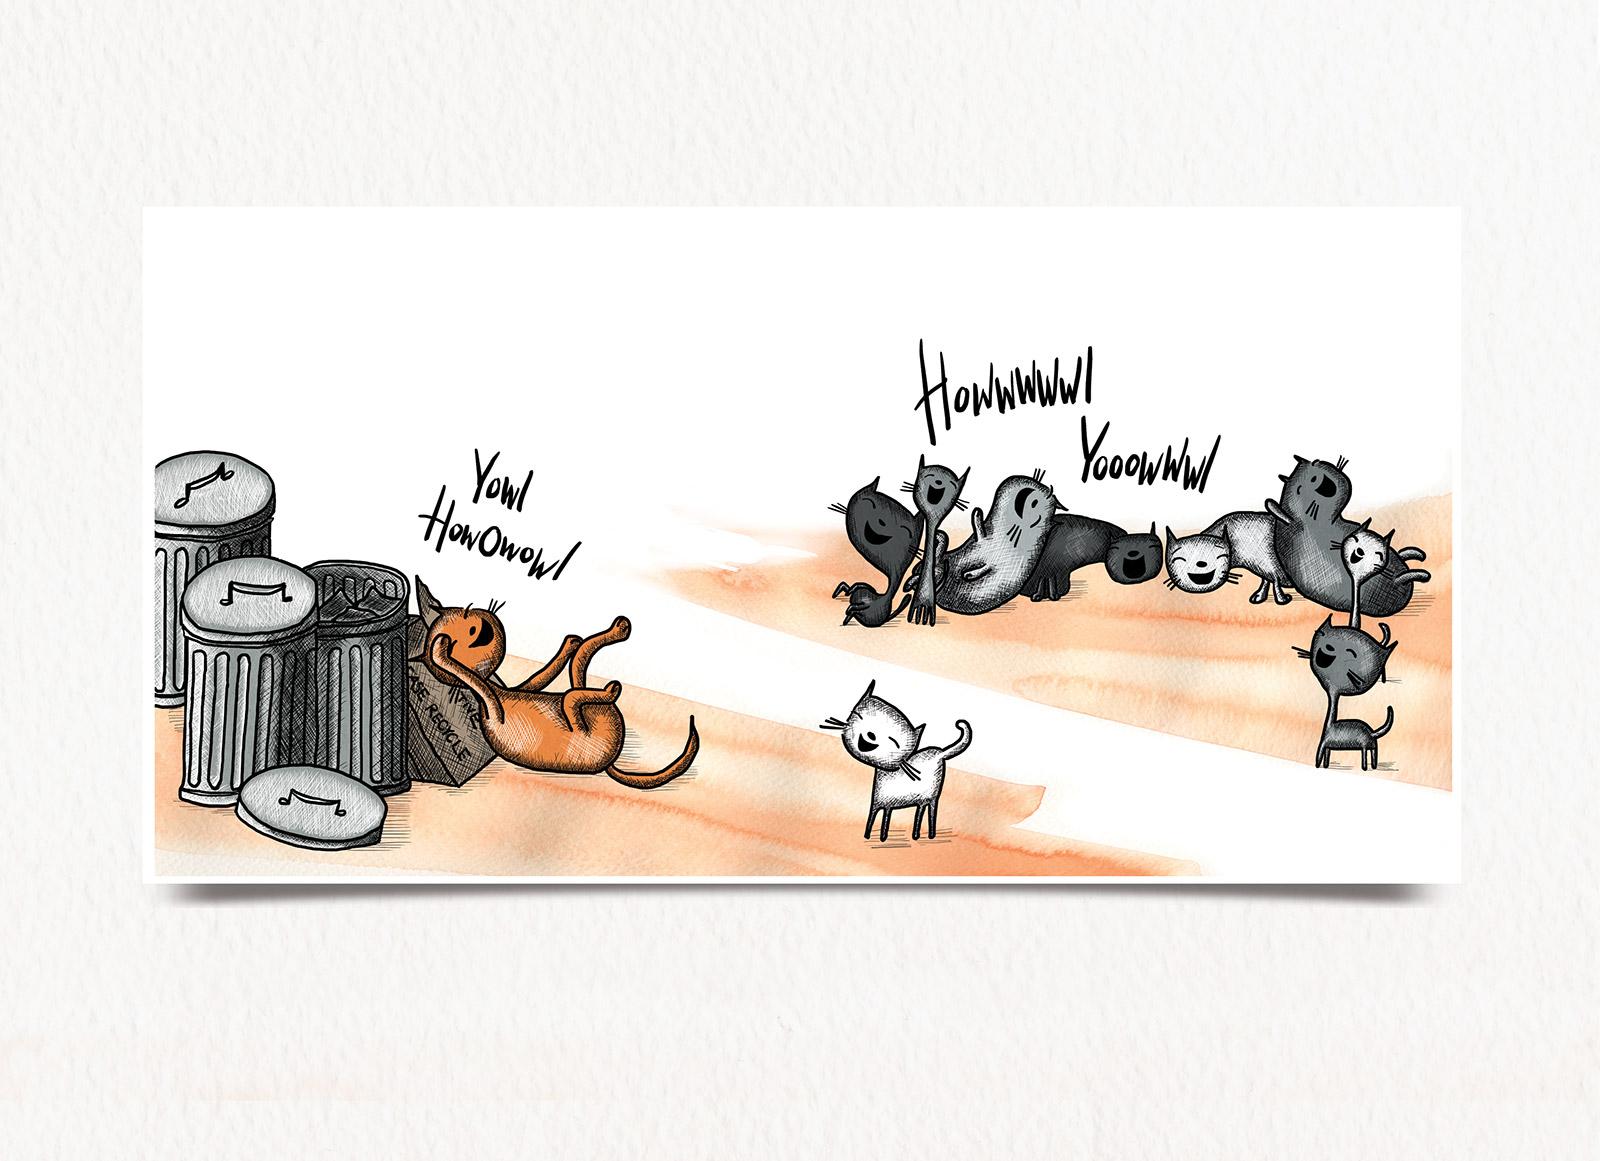 Cats trash